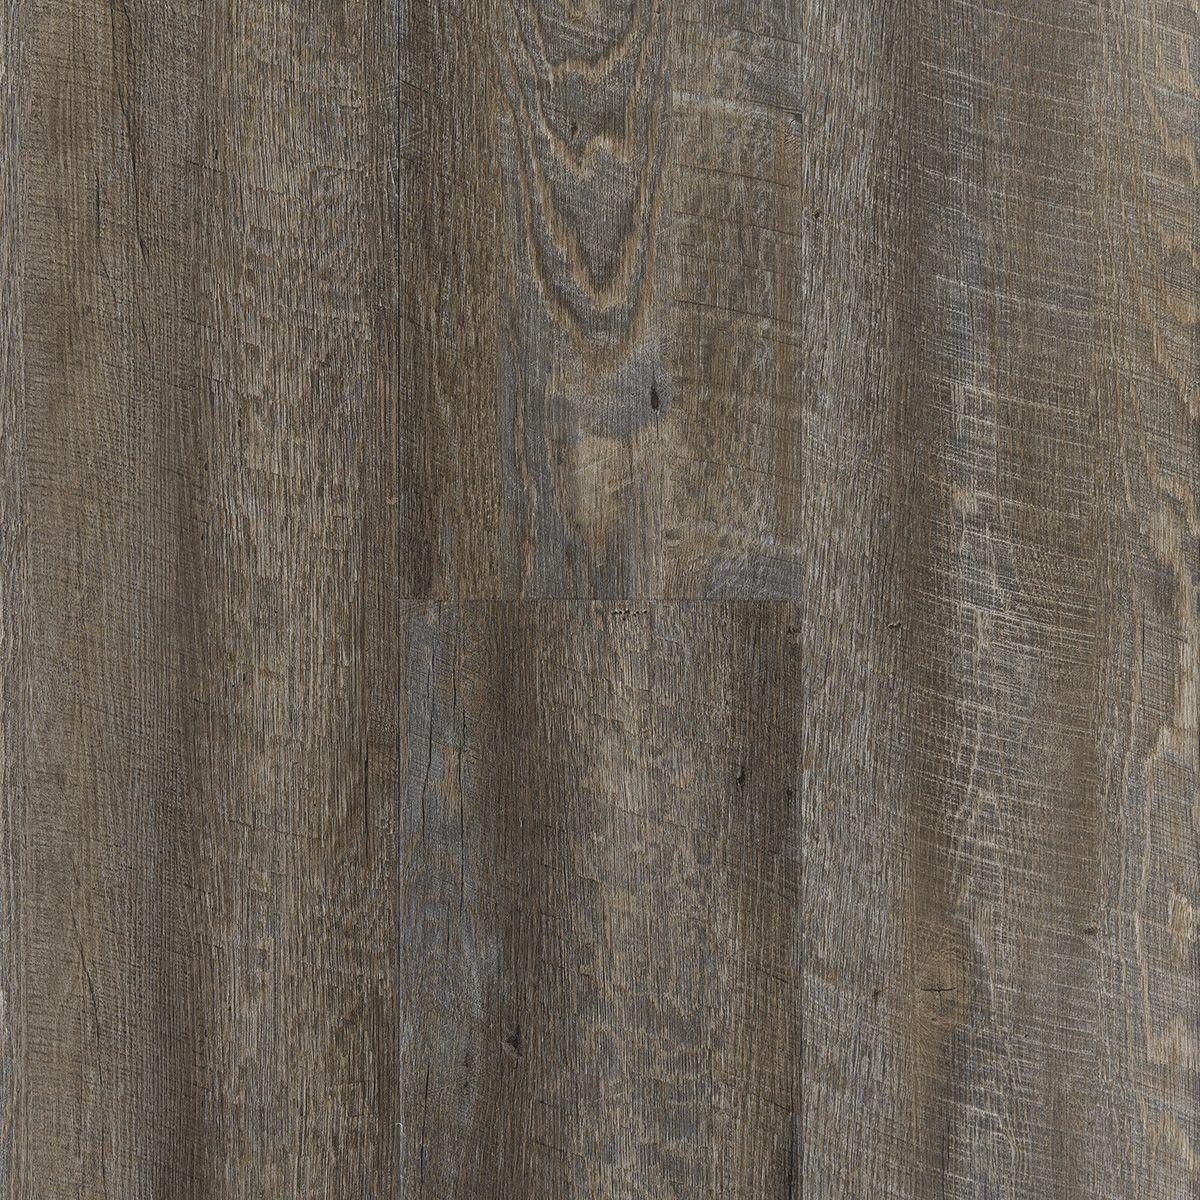 Hf753 Grey Flooring Luxury Vinyl Plank Flooring